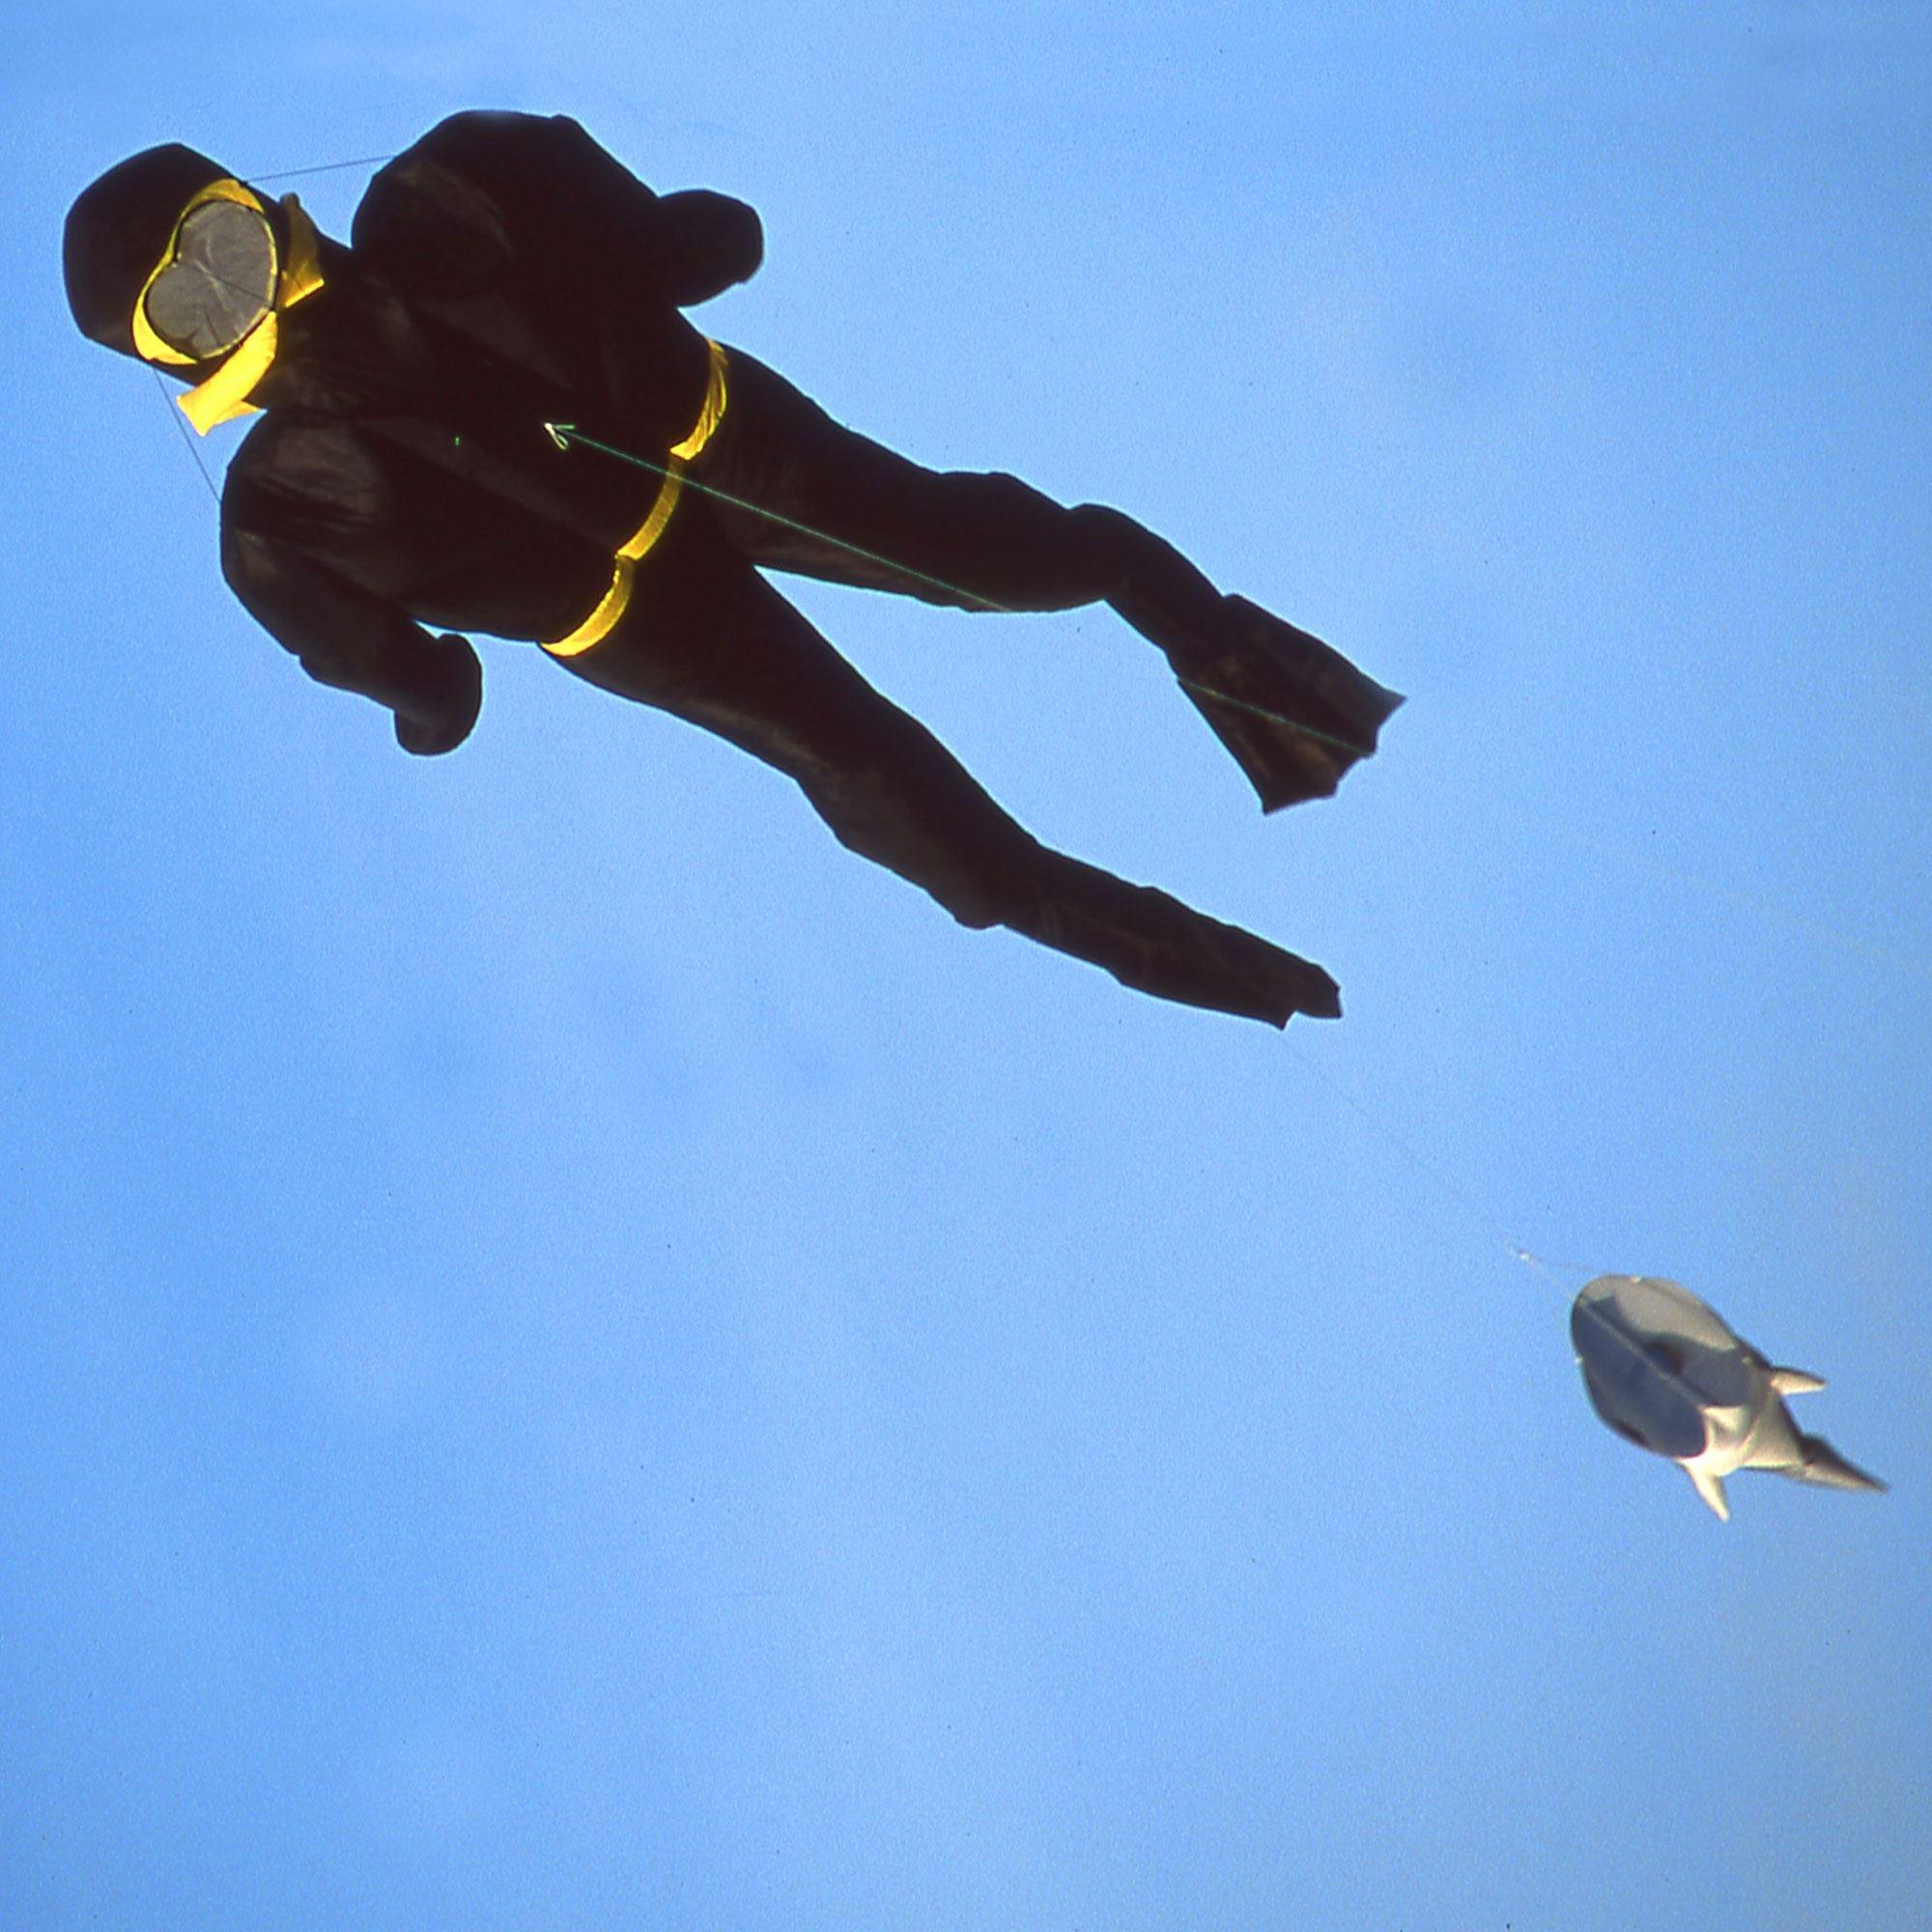 Martin Lester's Albert Ross: Scuba Diver Parafoil Kite